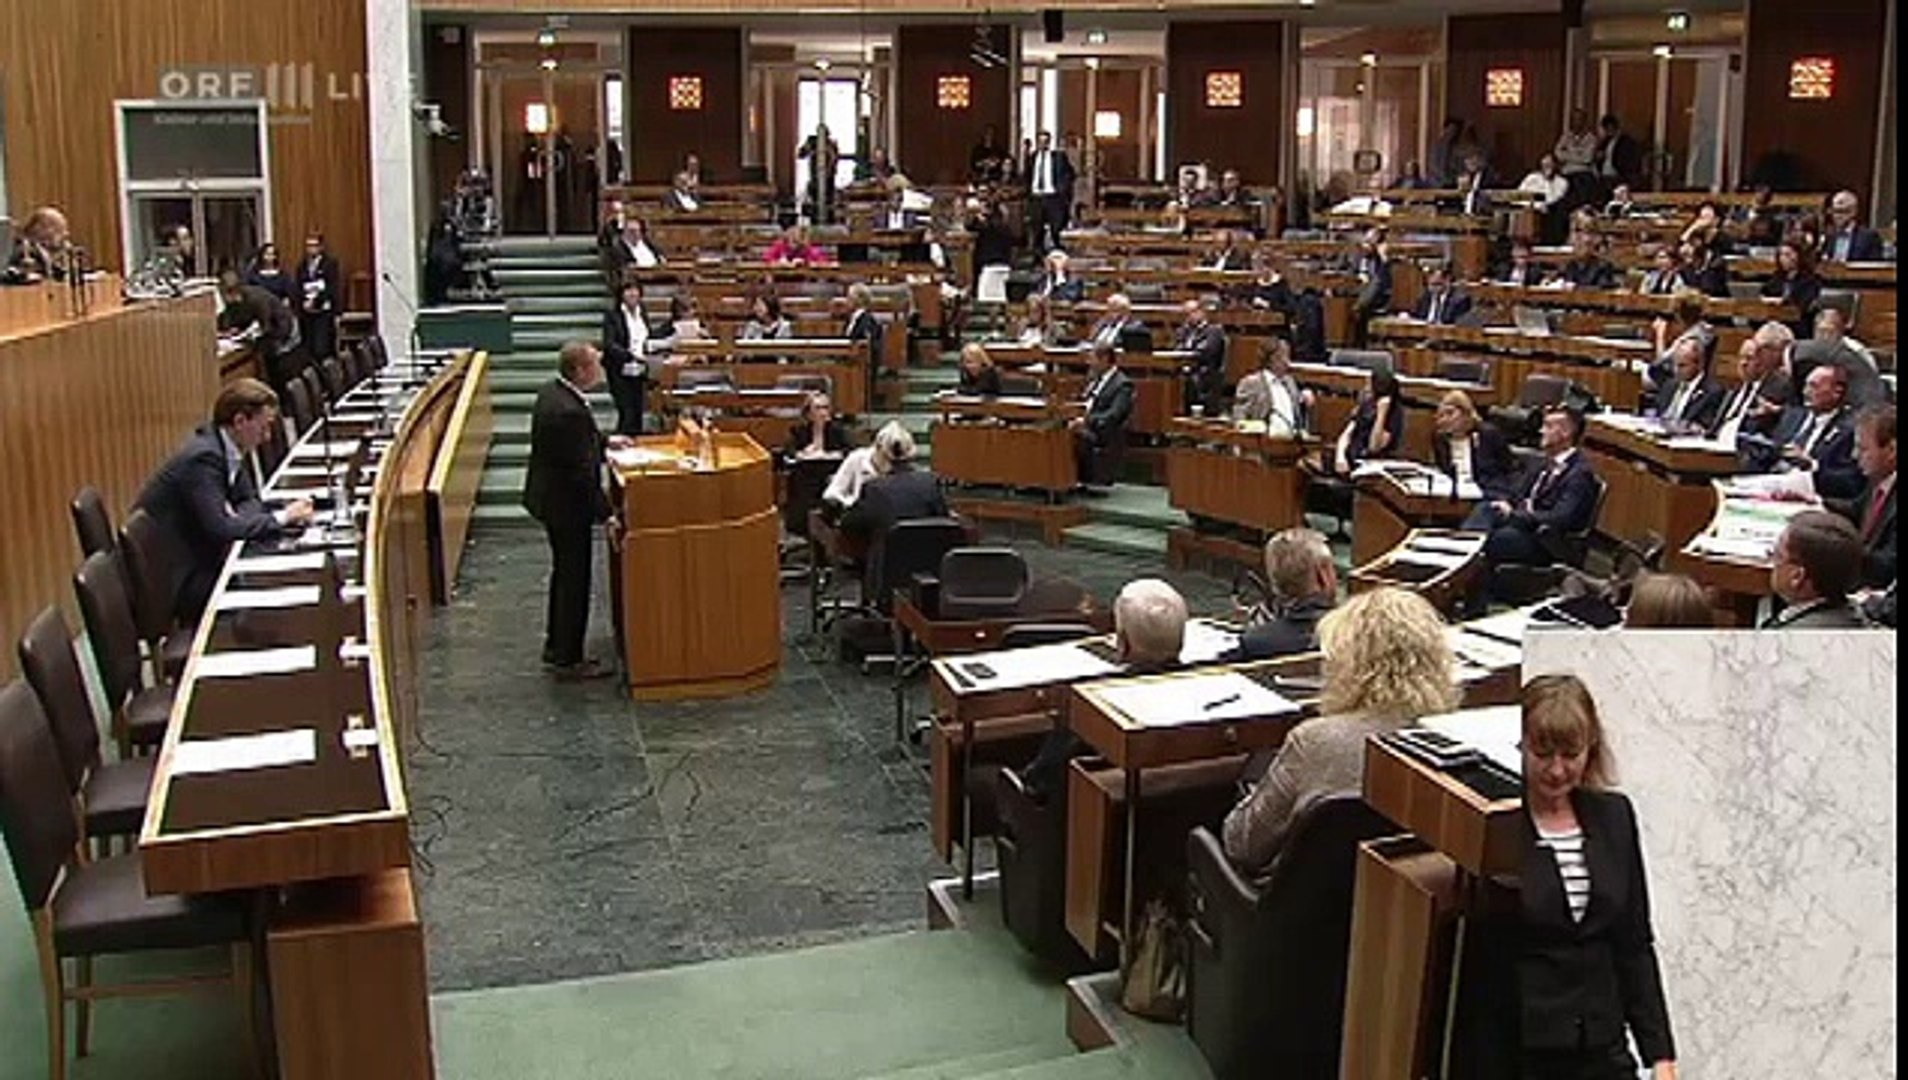 Plenarsitzung des Nationalrats Teil 2 Harald Vilimsky FPÖ 2015 09 23 0900 tl 06 Politik LIVE H